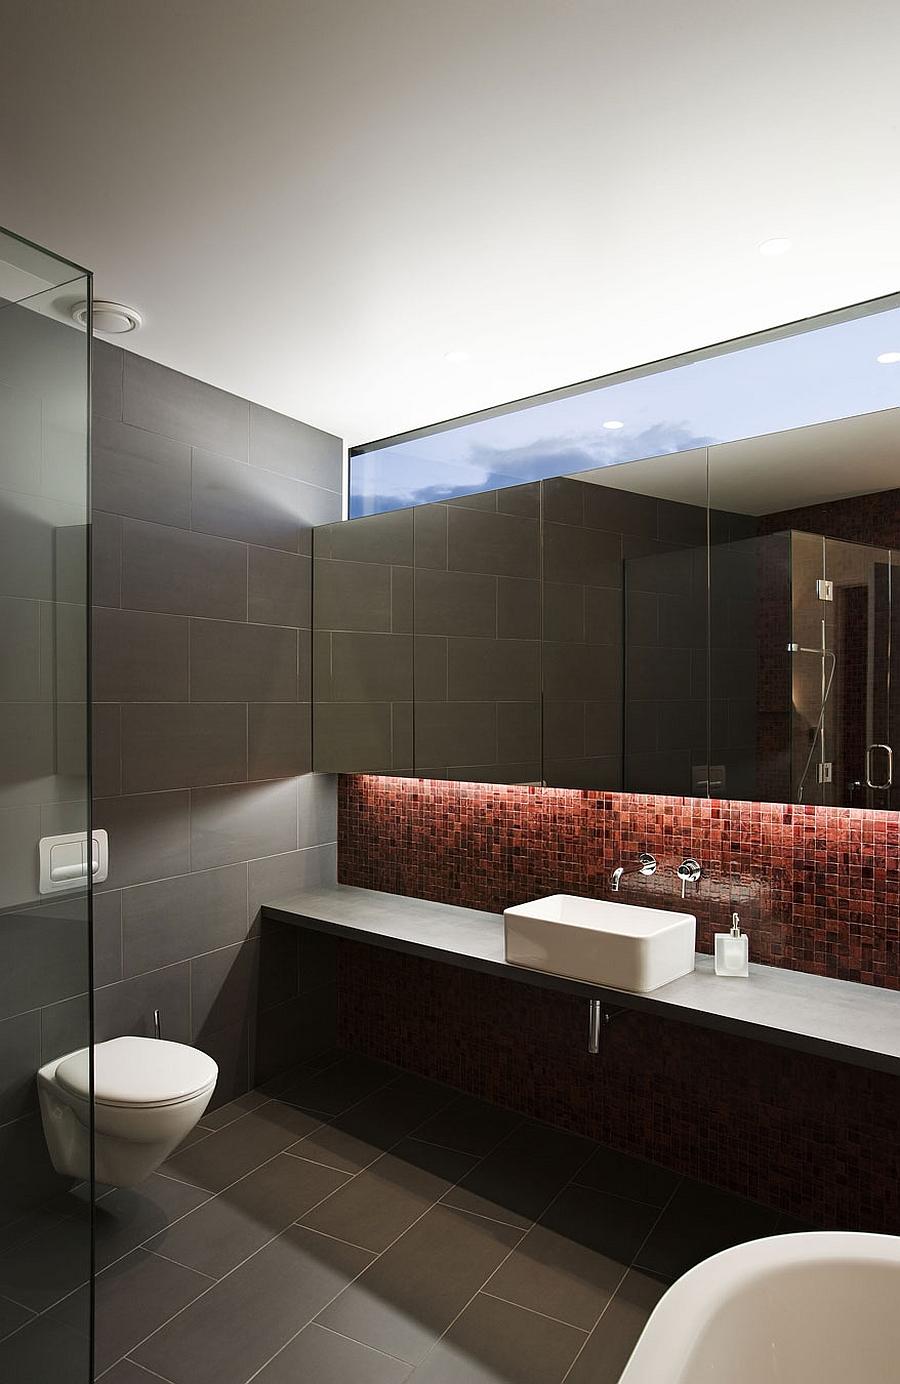 Sleek modern bathroom in grey and red